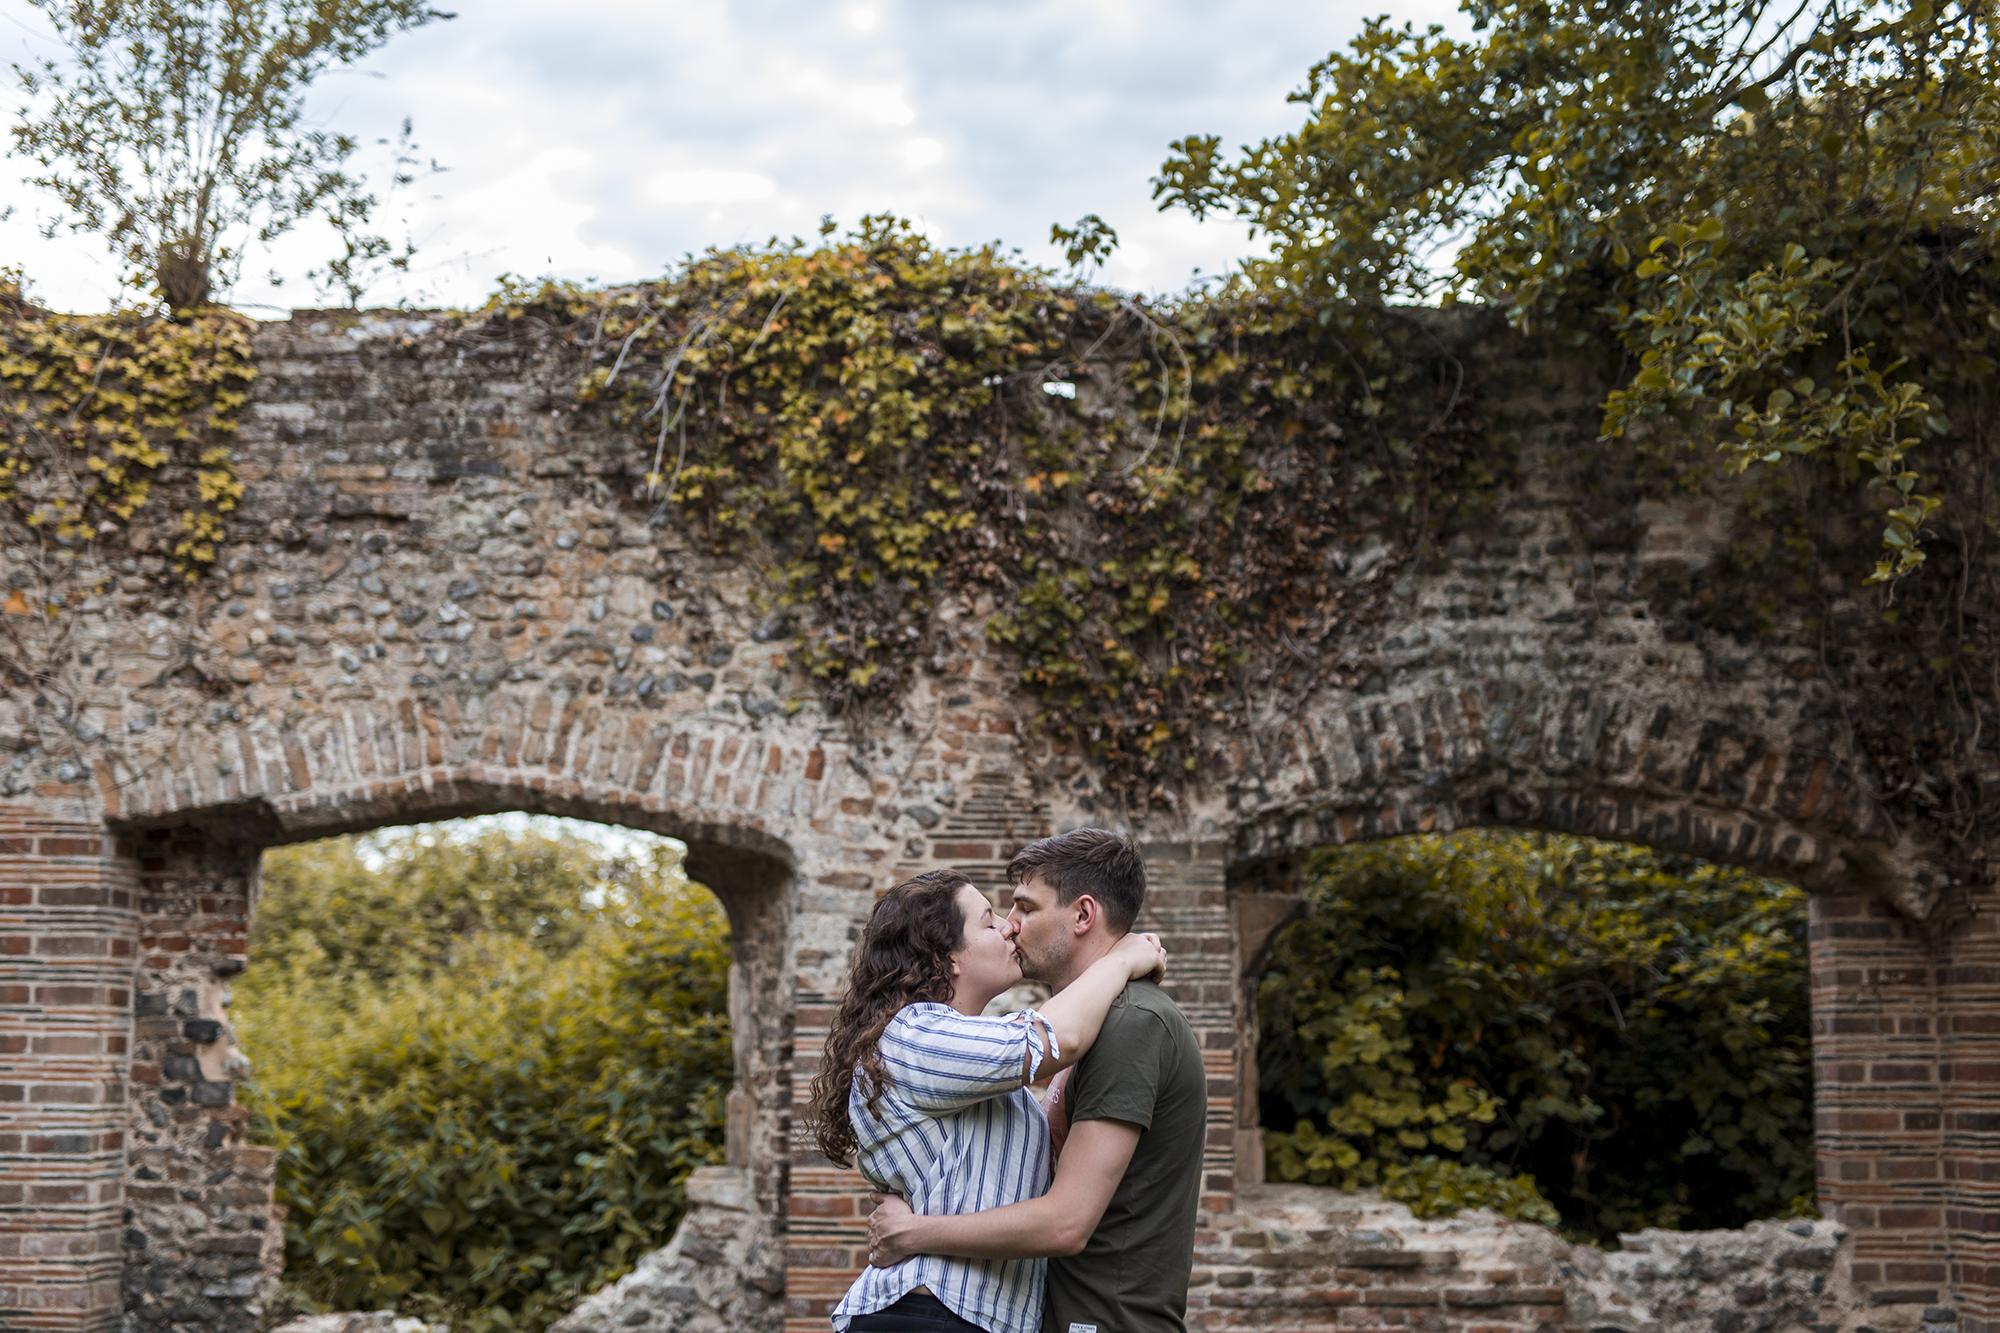 Becca & James Engagement_53.JPG